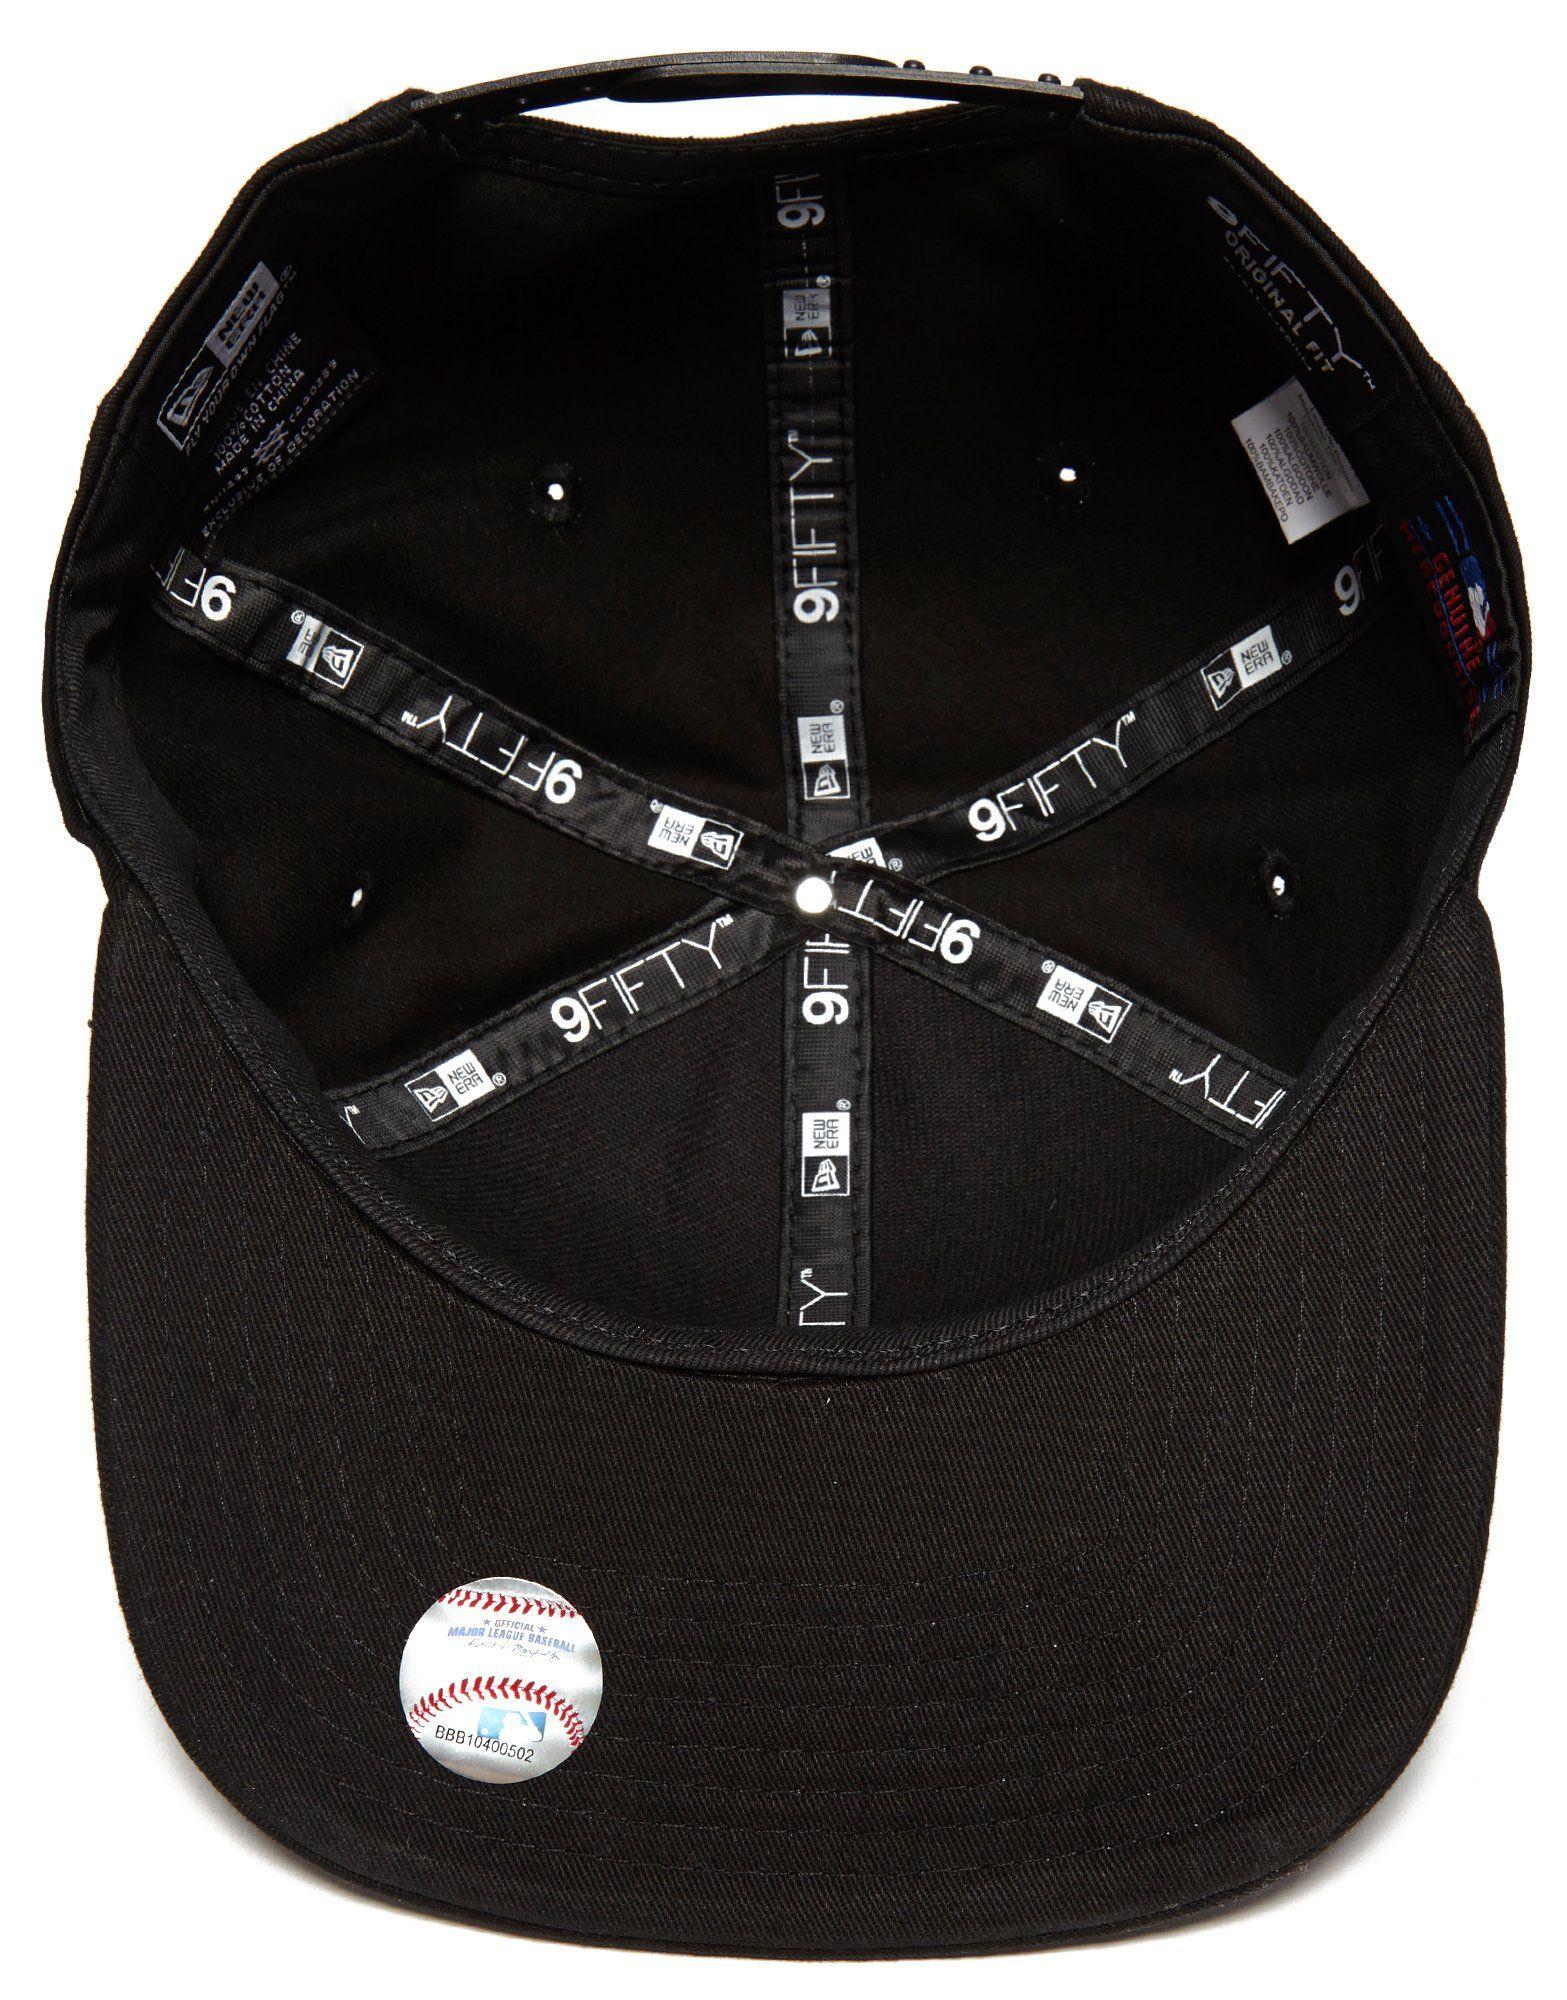 New Era MLB New York Yankees 9FIFTY Metallic Badge Cap